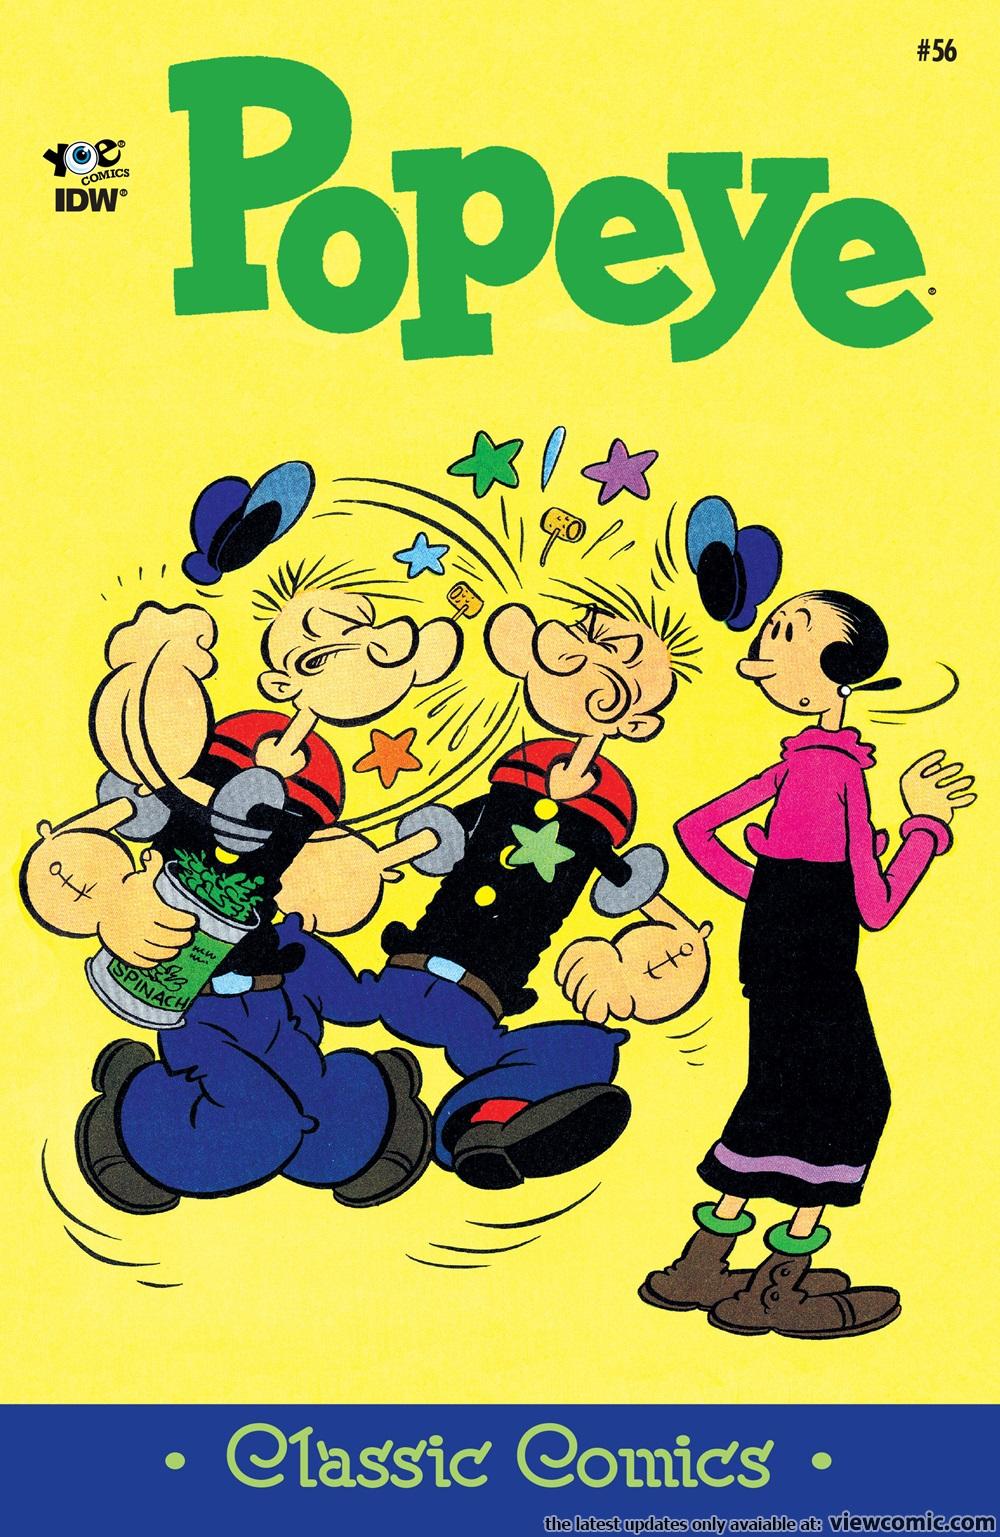 Classic Popeye 056 (2017)……………………… | Viewcomic reading